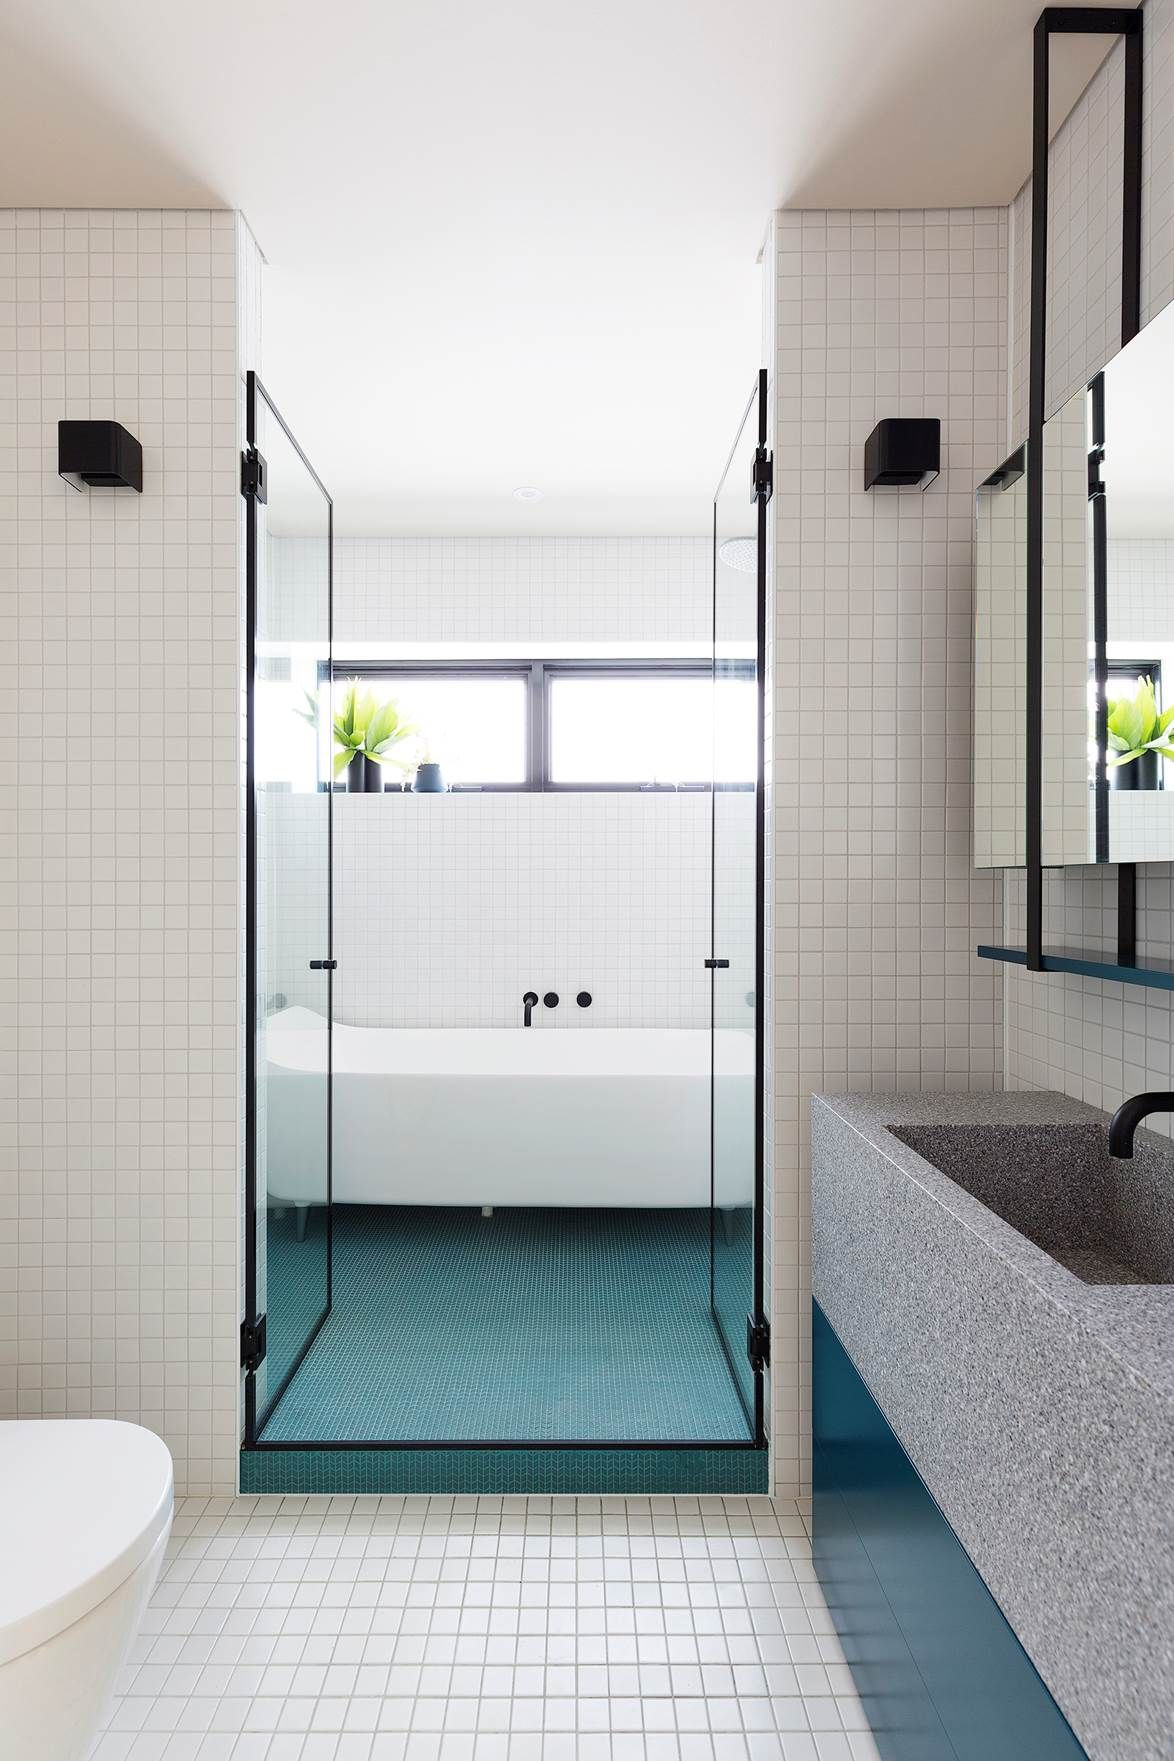 h g top 50 rooms 2018 bathrooms and laundries bathroom on bathroom renovation ideas australia id=85096